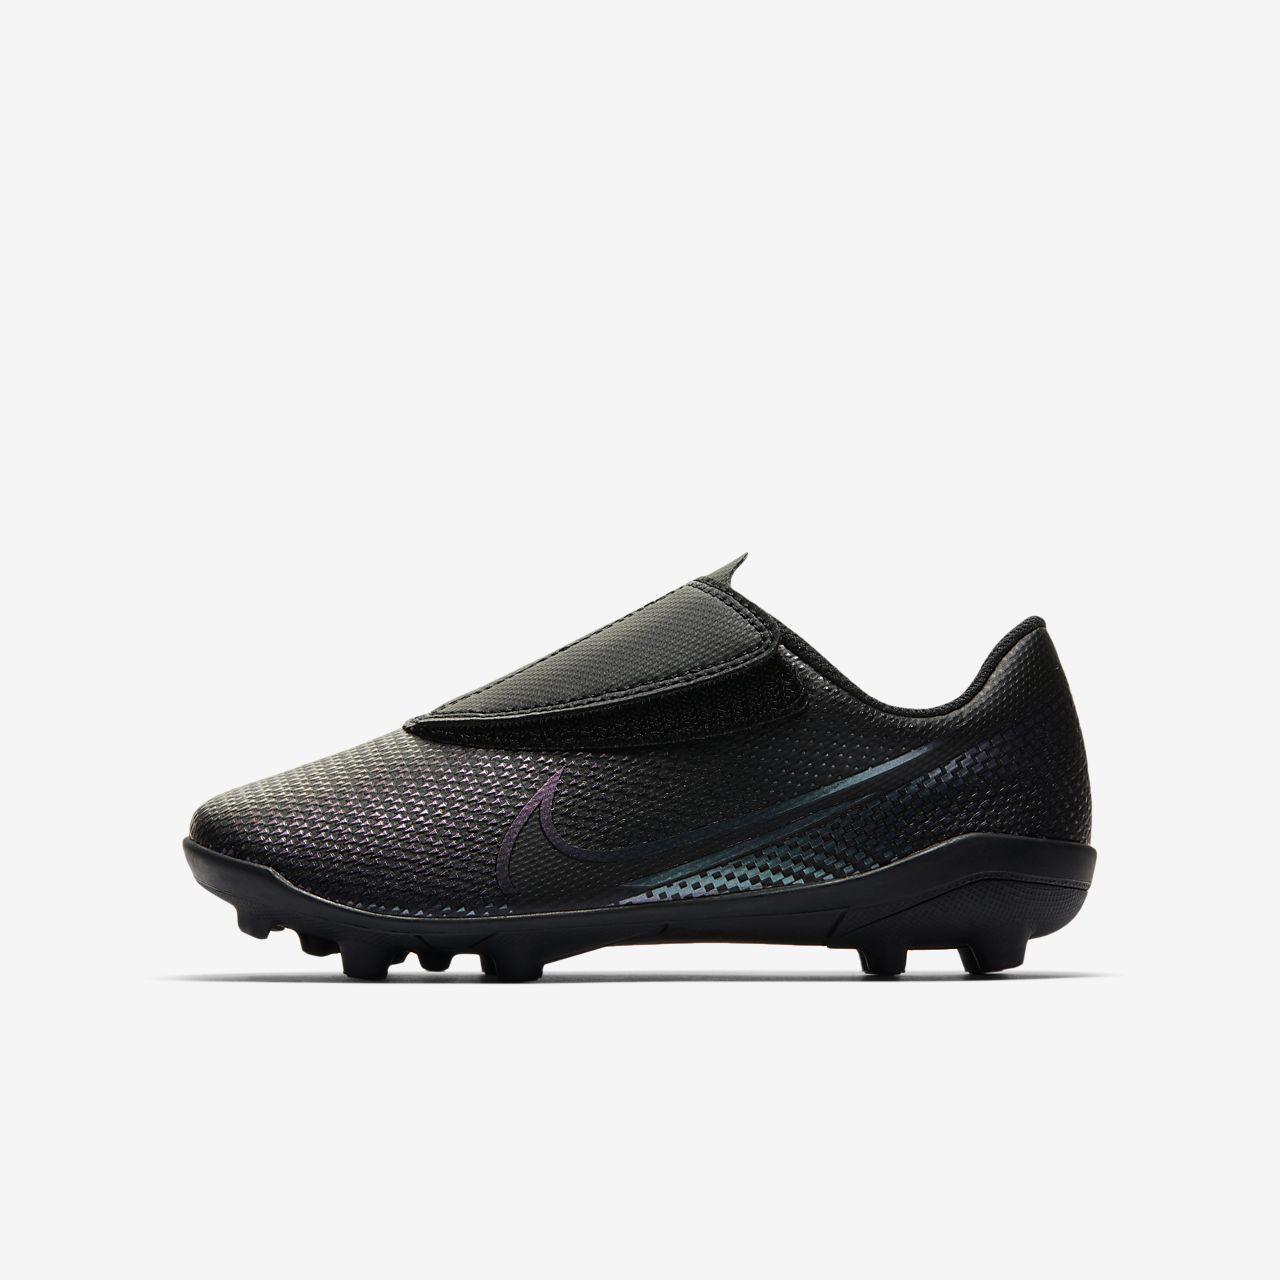 Nike Jr. Mercurial Vapor 13 Club MG Toddler/Younger Kids' Multi-Ground Football Boot